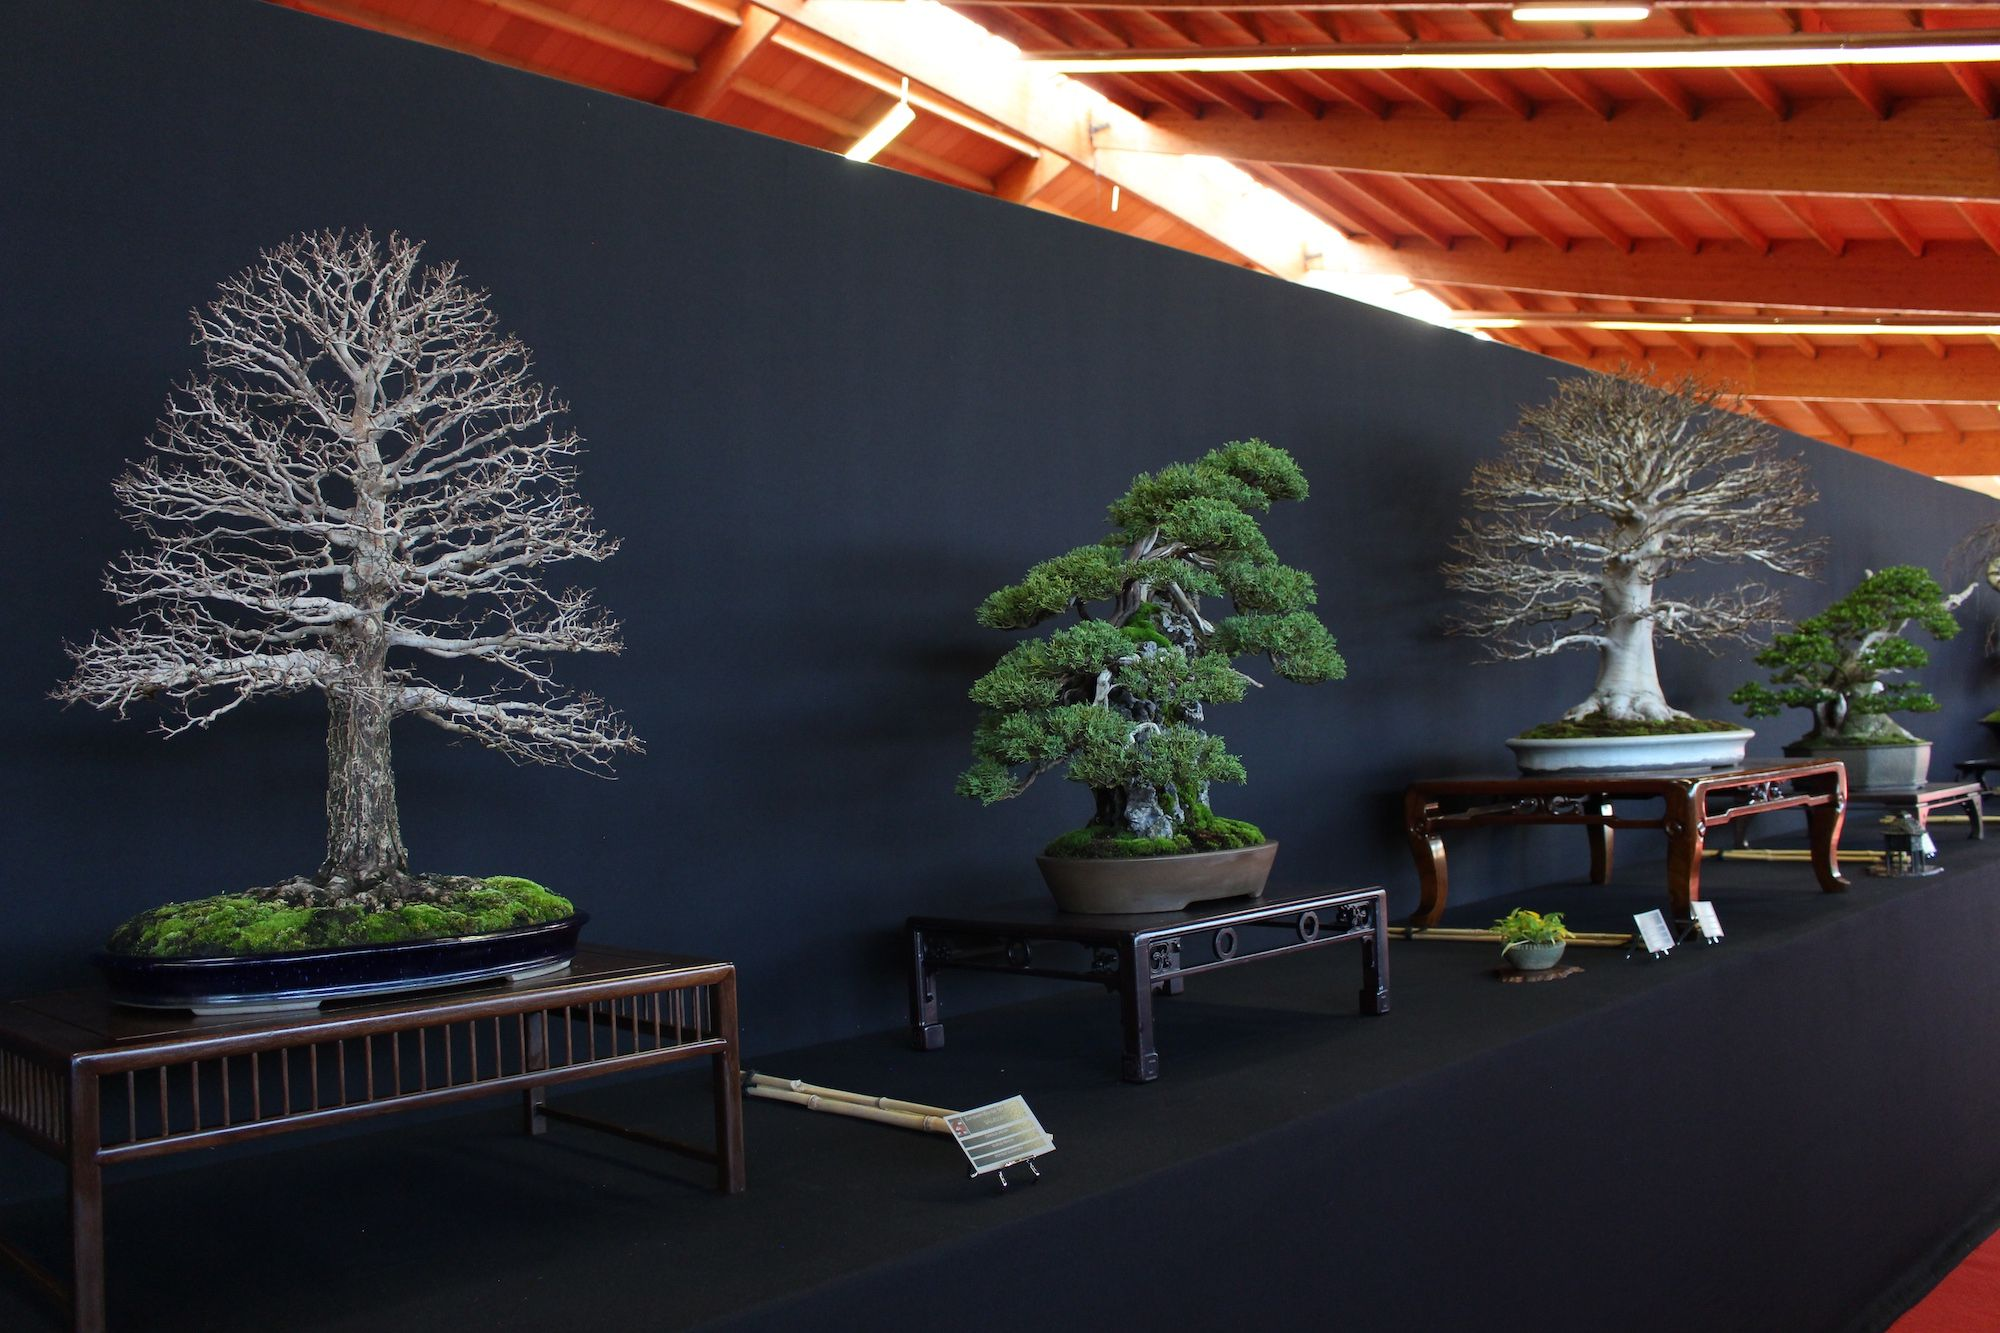 bonsai tree bonsai indoor bench